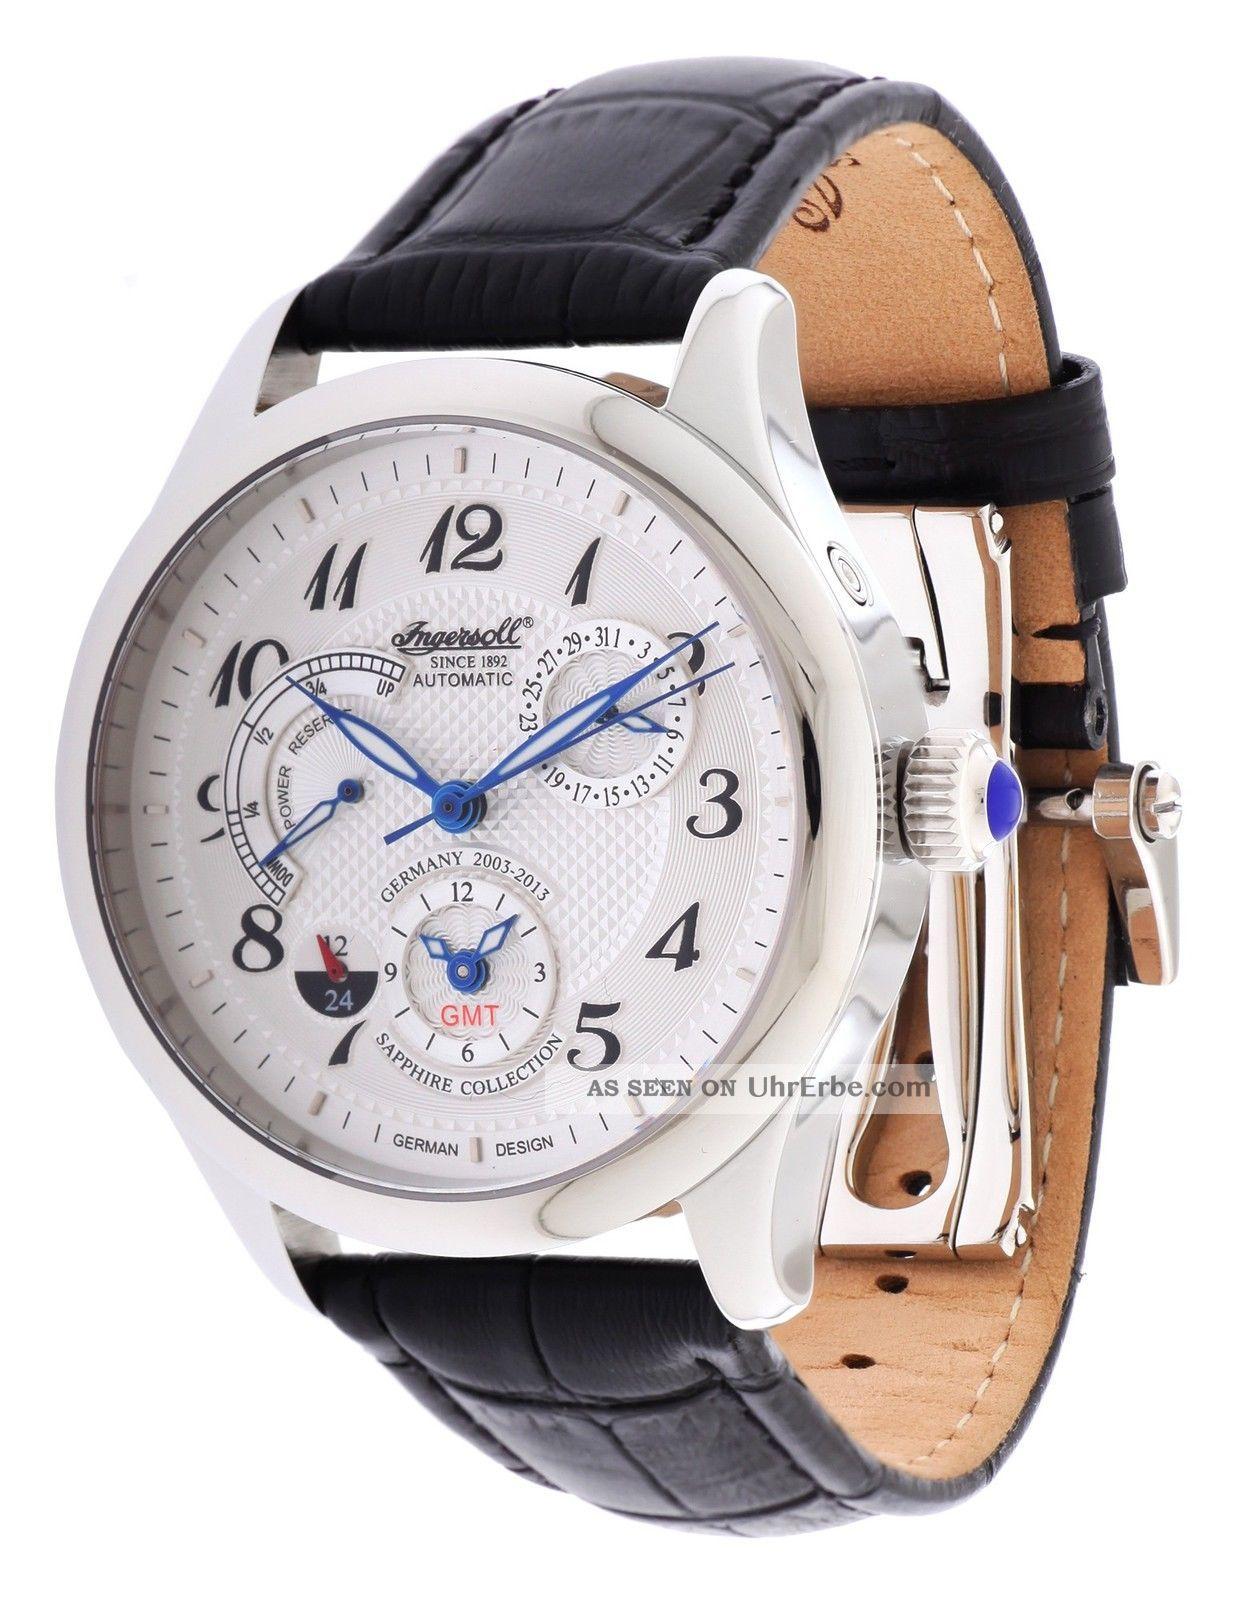 Ingersoll Herren Armbanduhr Sam Limited Edition Schwarz In8410wh Armbanduhren Bild